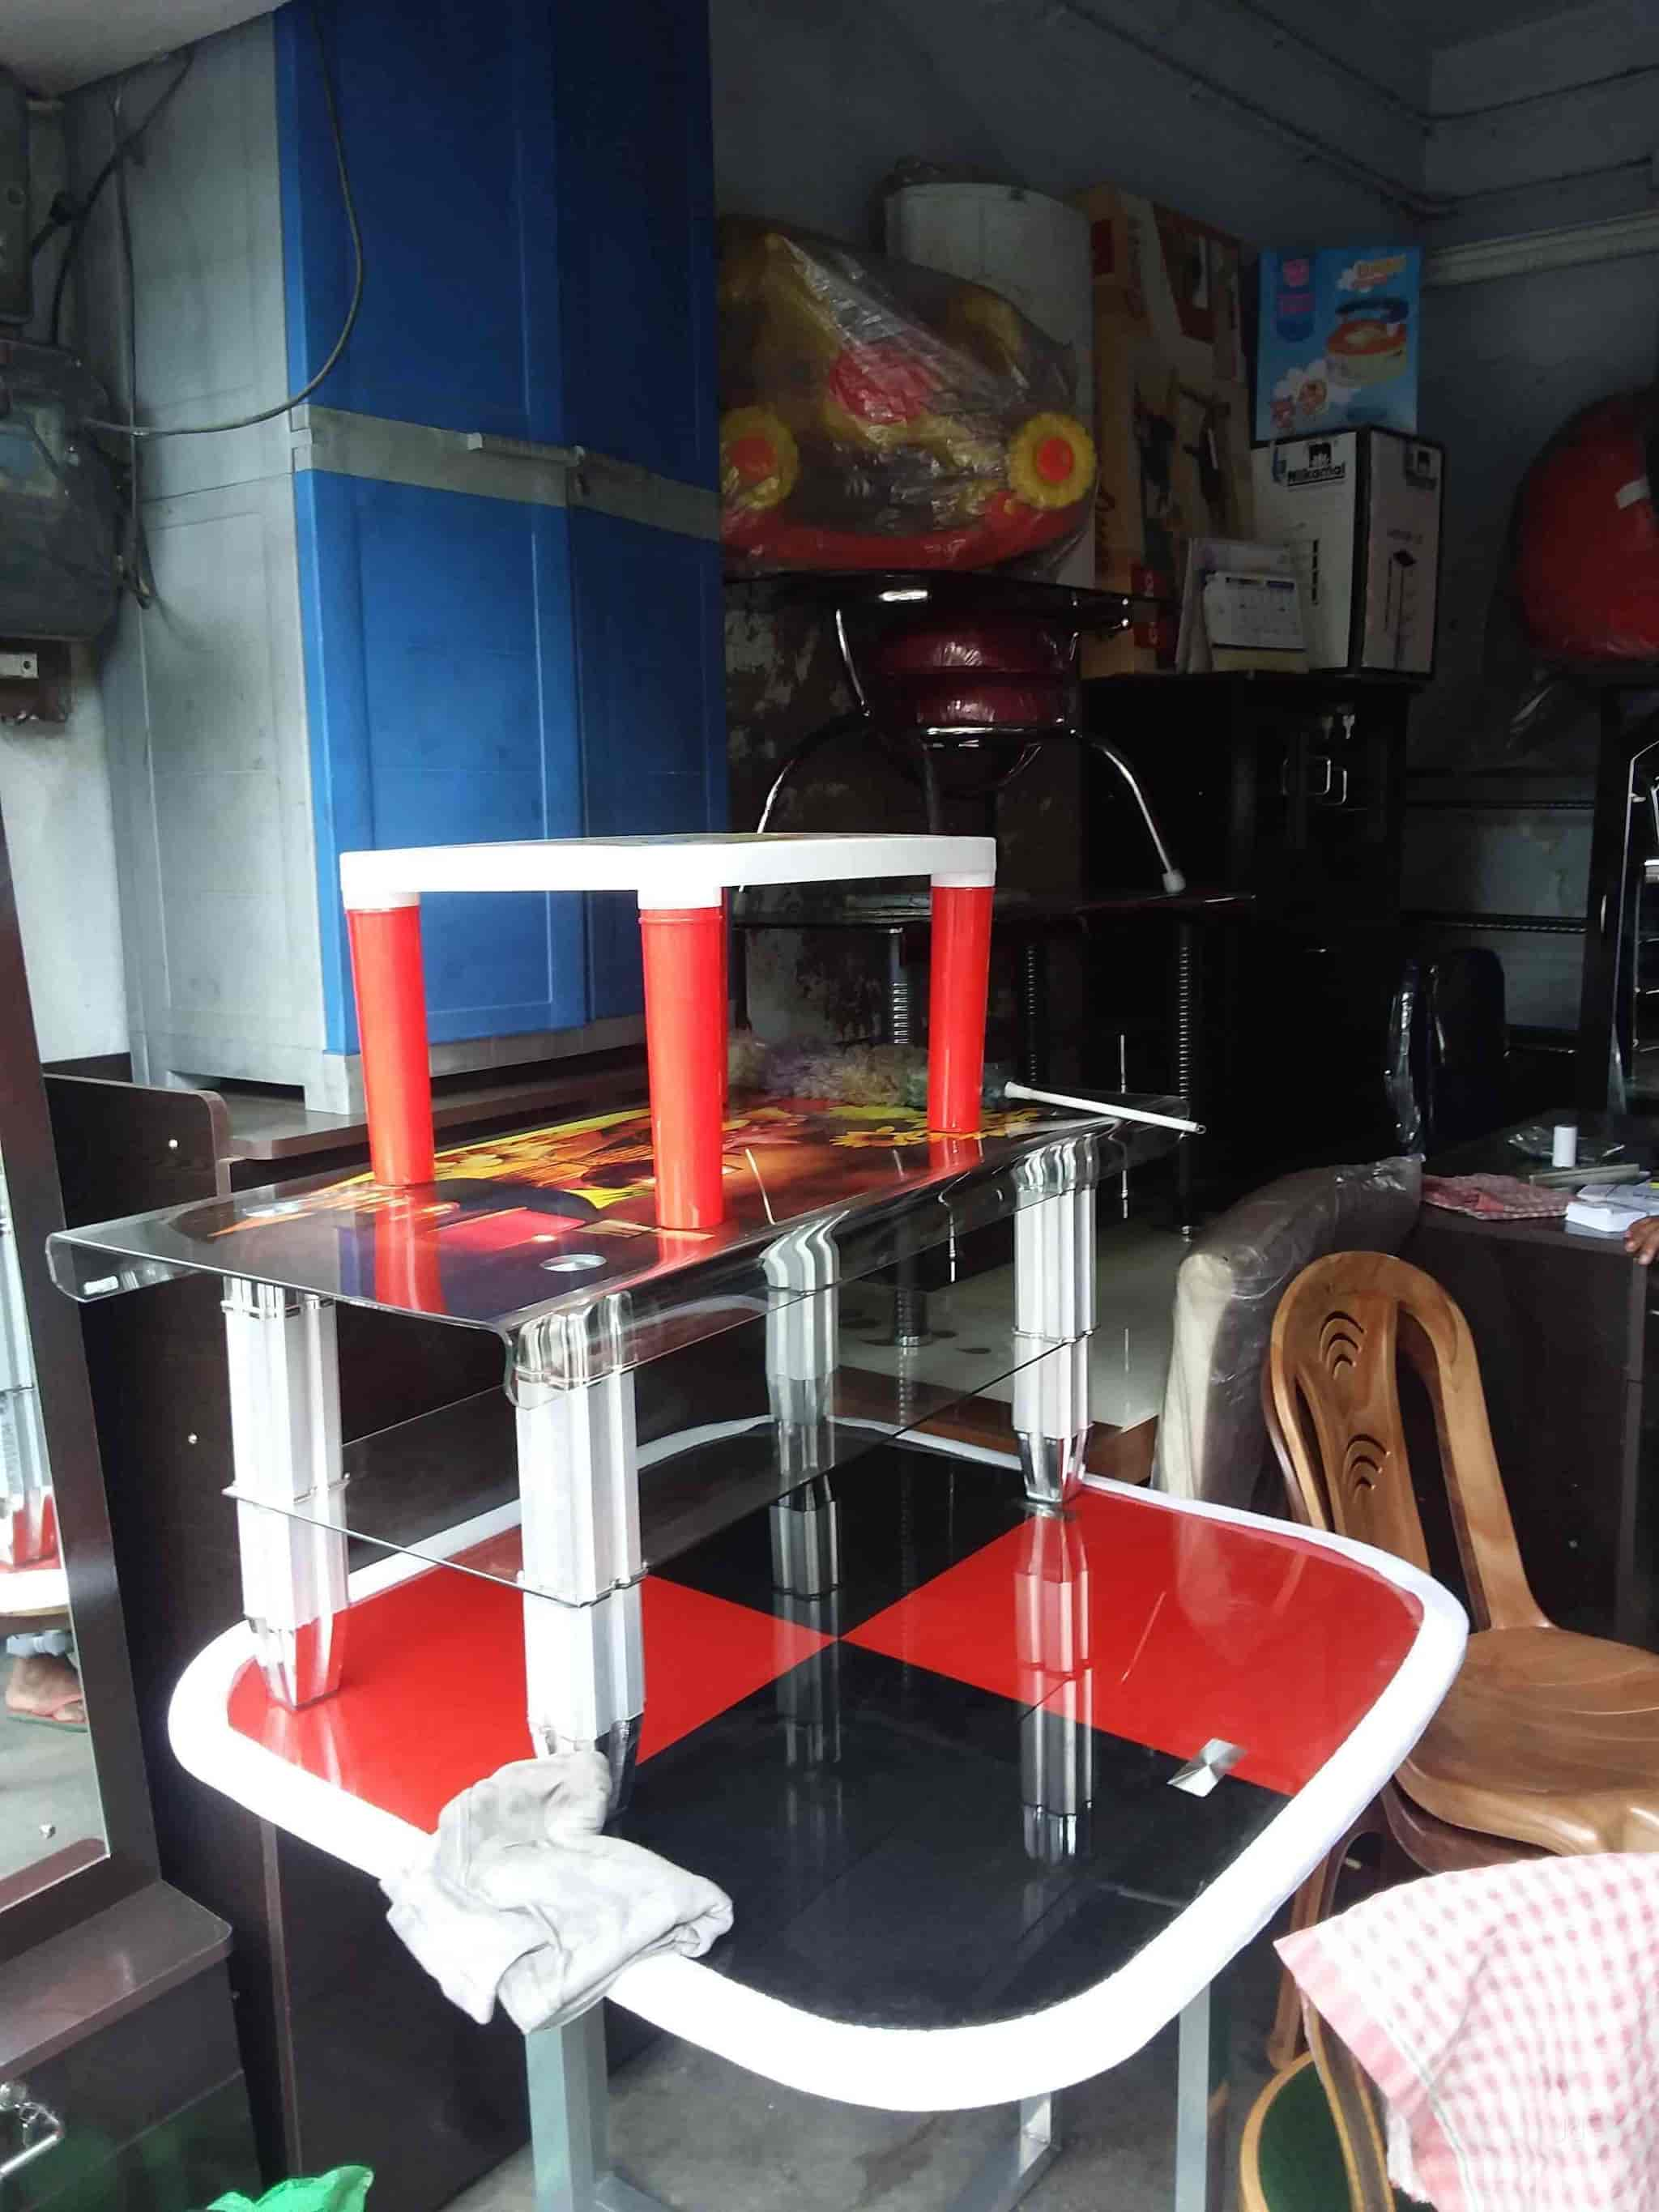 Furniture Next Photos, Barrackpore, Kolkata- Pictures